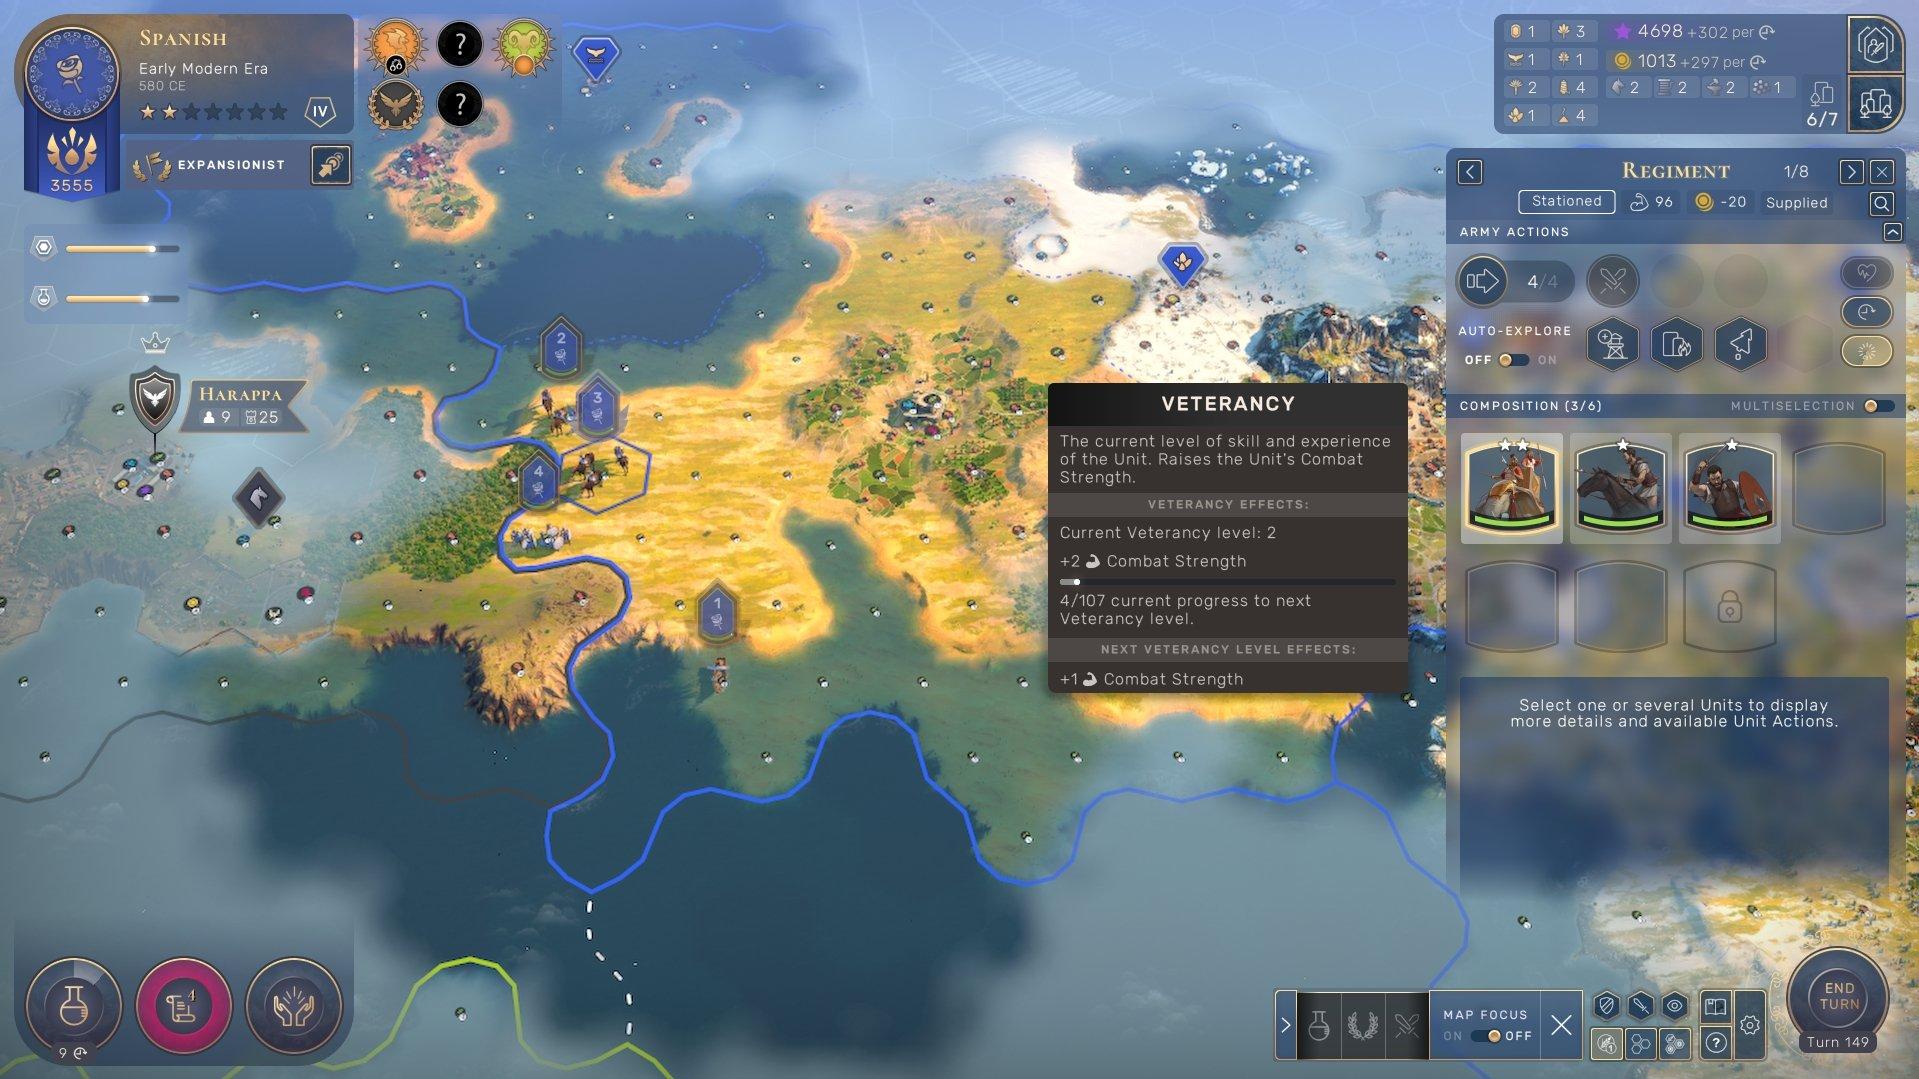 Humankind - Veterancy Levels Screenshot